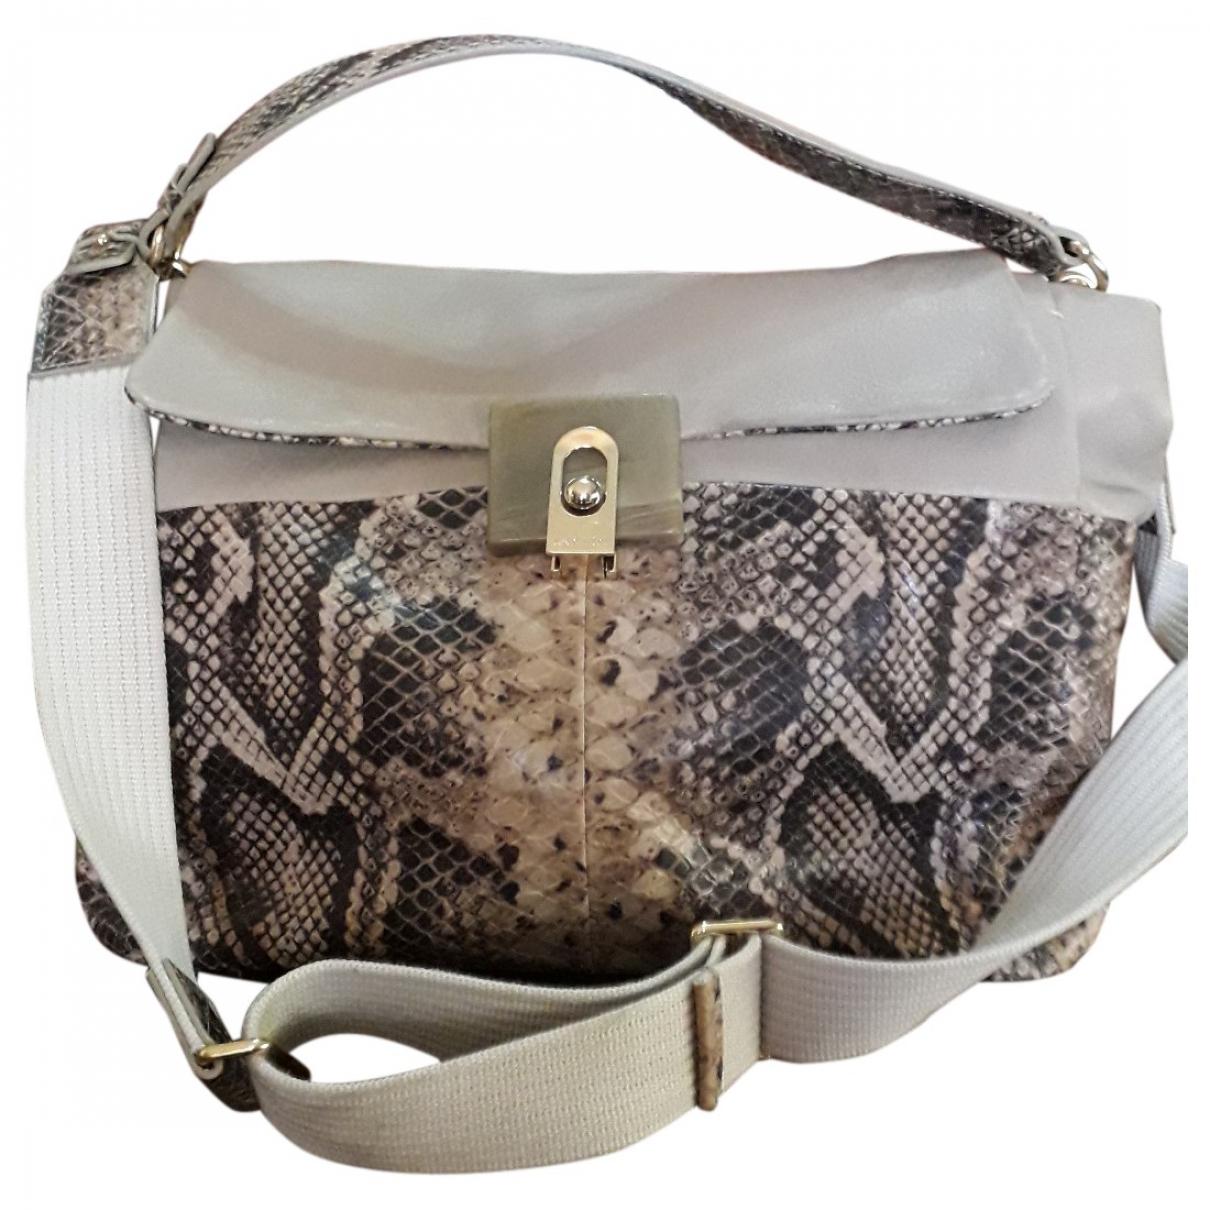 Lanvin \N Anthracite Leather handbag for Women \N